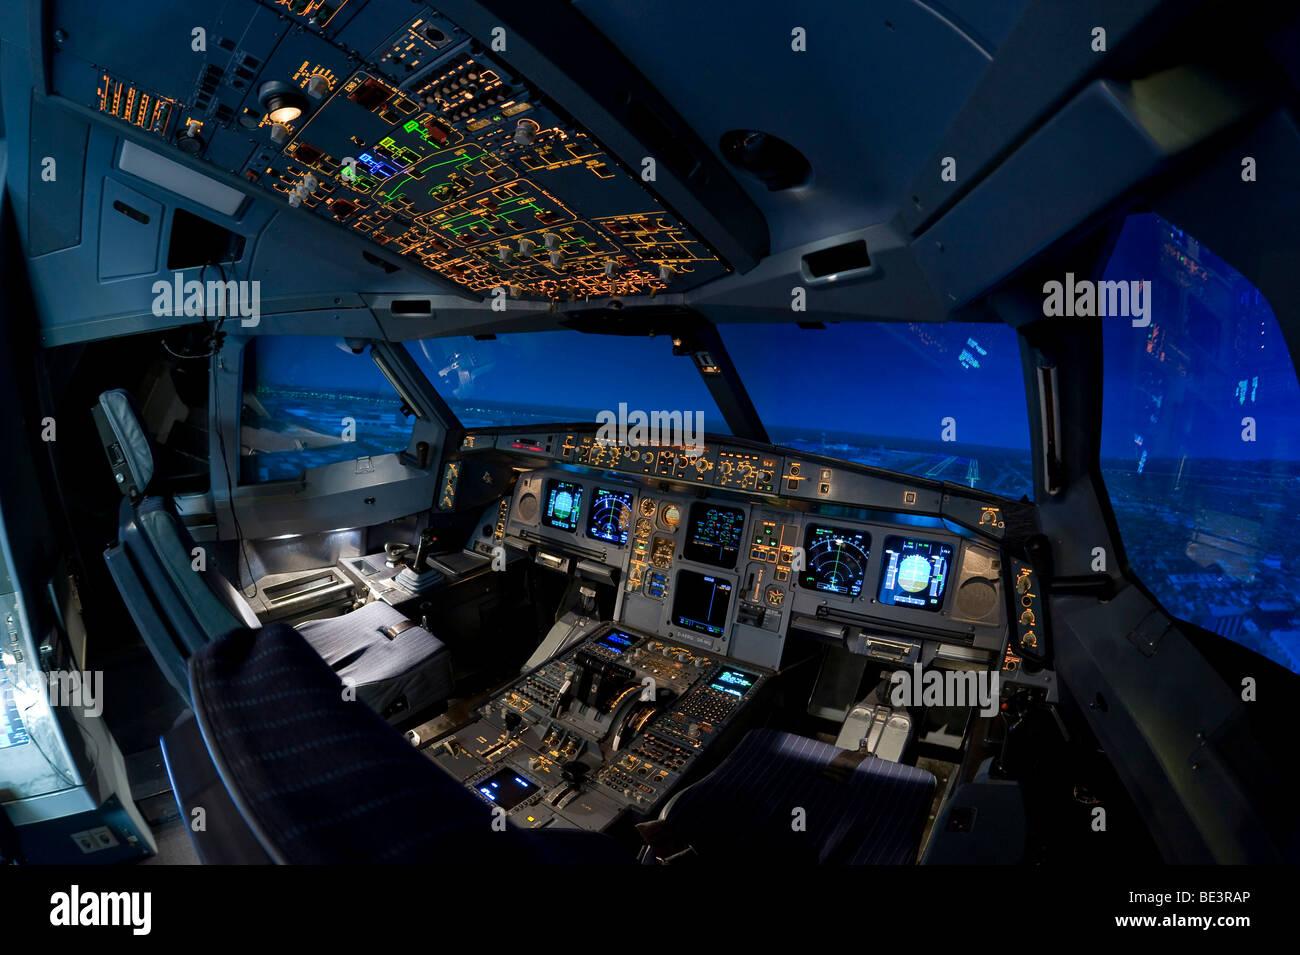 Zentrum fuer Flugsimulation Flight Simulation Center Berlin, ZFB, cockpit of an Airbus A330/340 flight simulator, - Stock Image